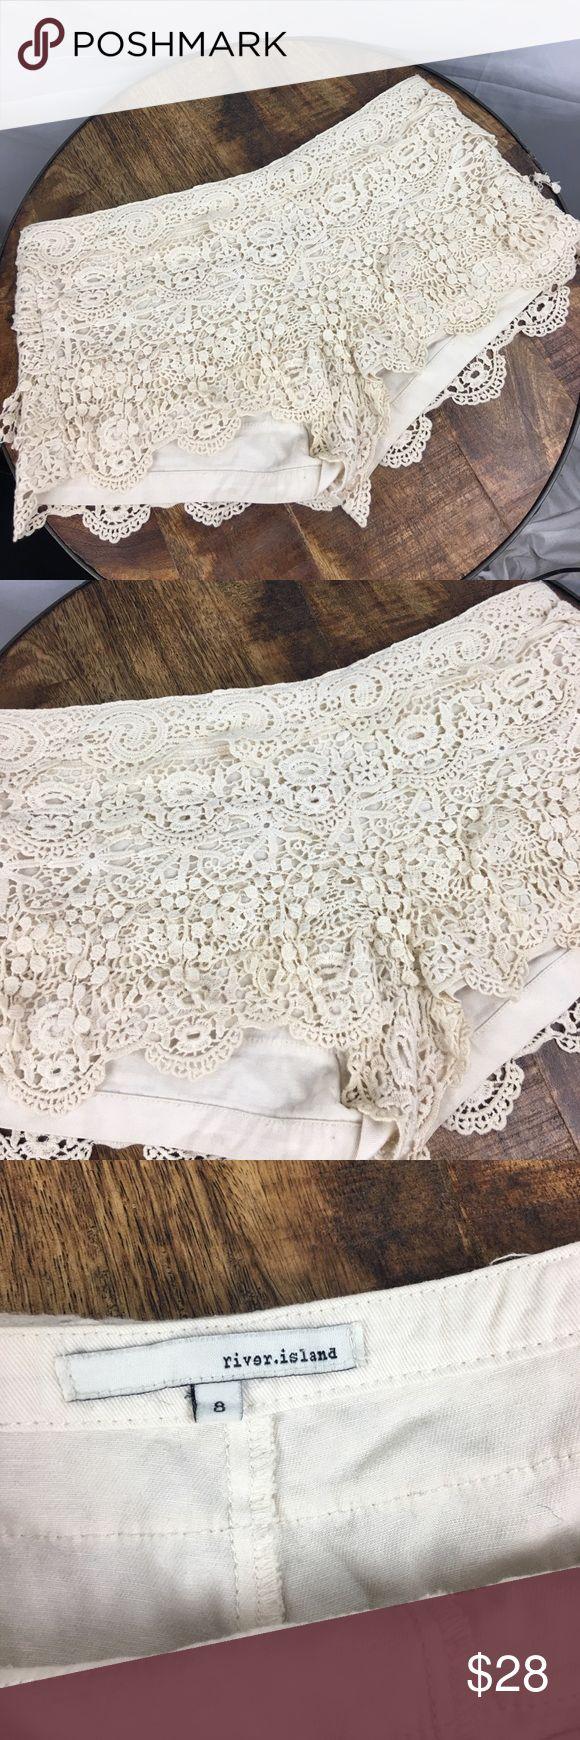 Crochet shorts Cute boho girl shorts. Preloved condition River Island Shorts